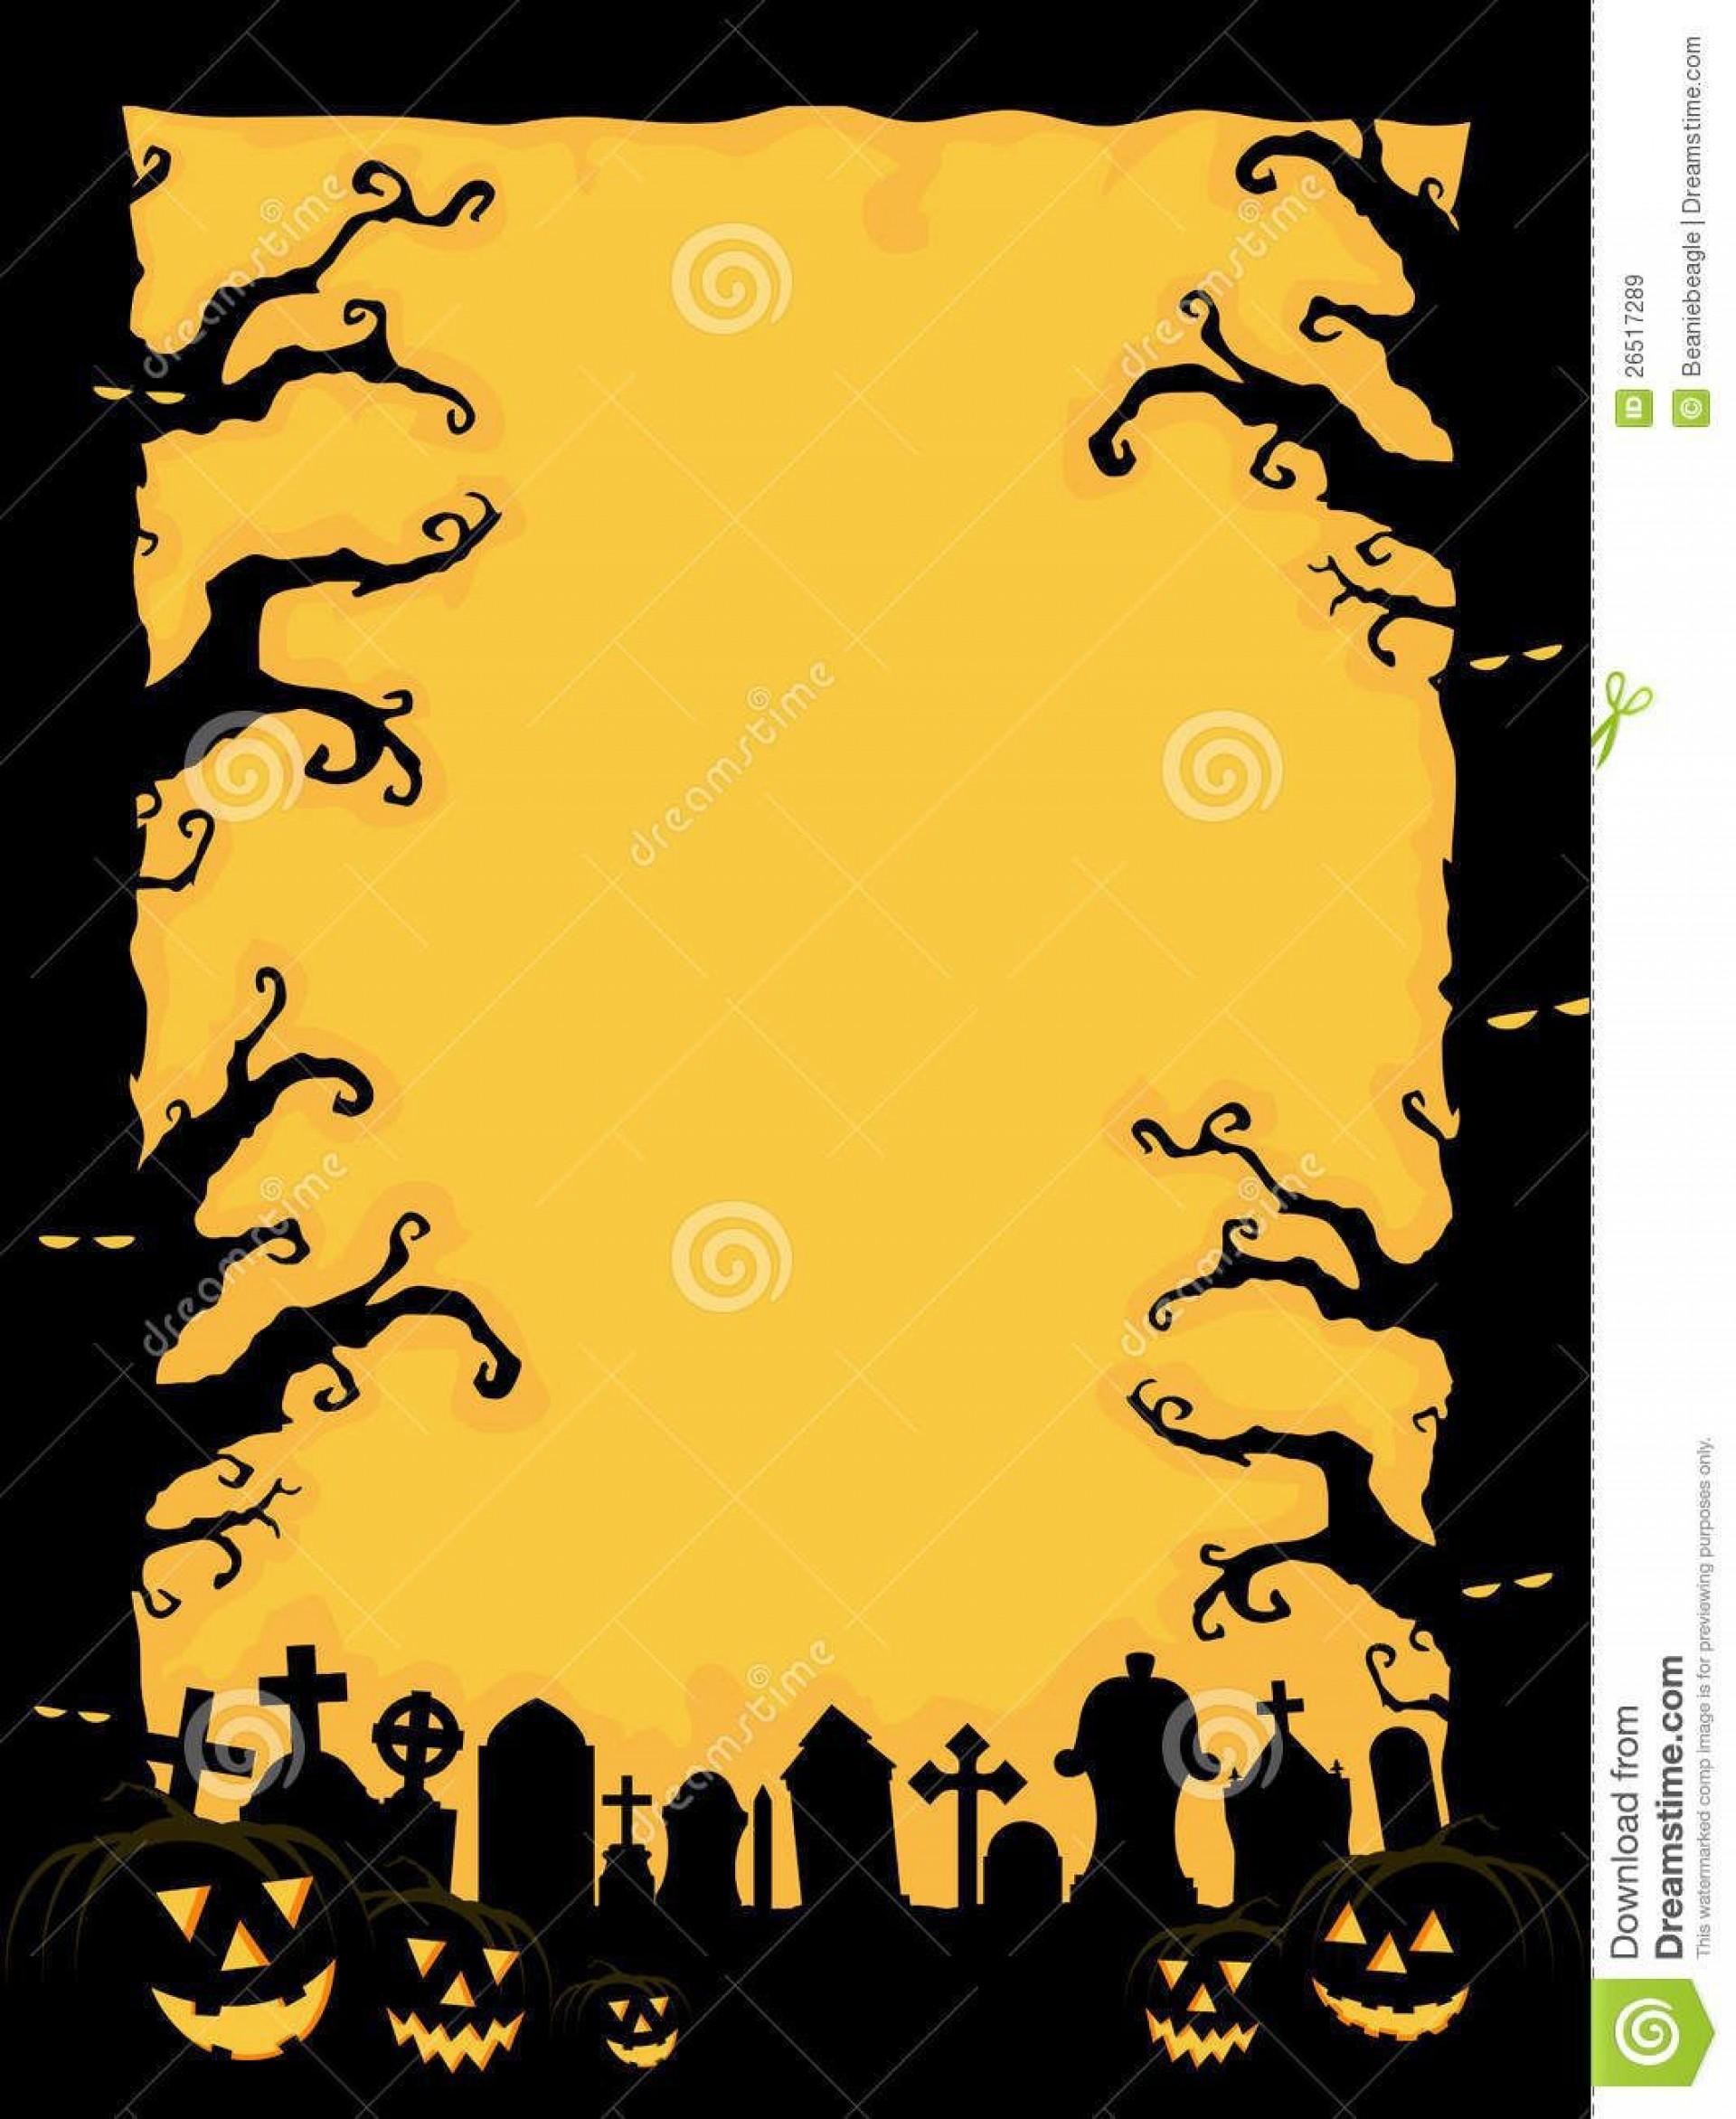 003 Striking Free Halloween Invitation Template Design  Templates Microsoft Word Wedding Printable Party1920